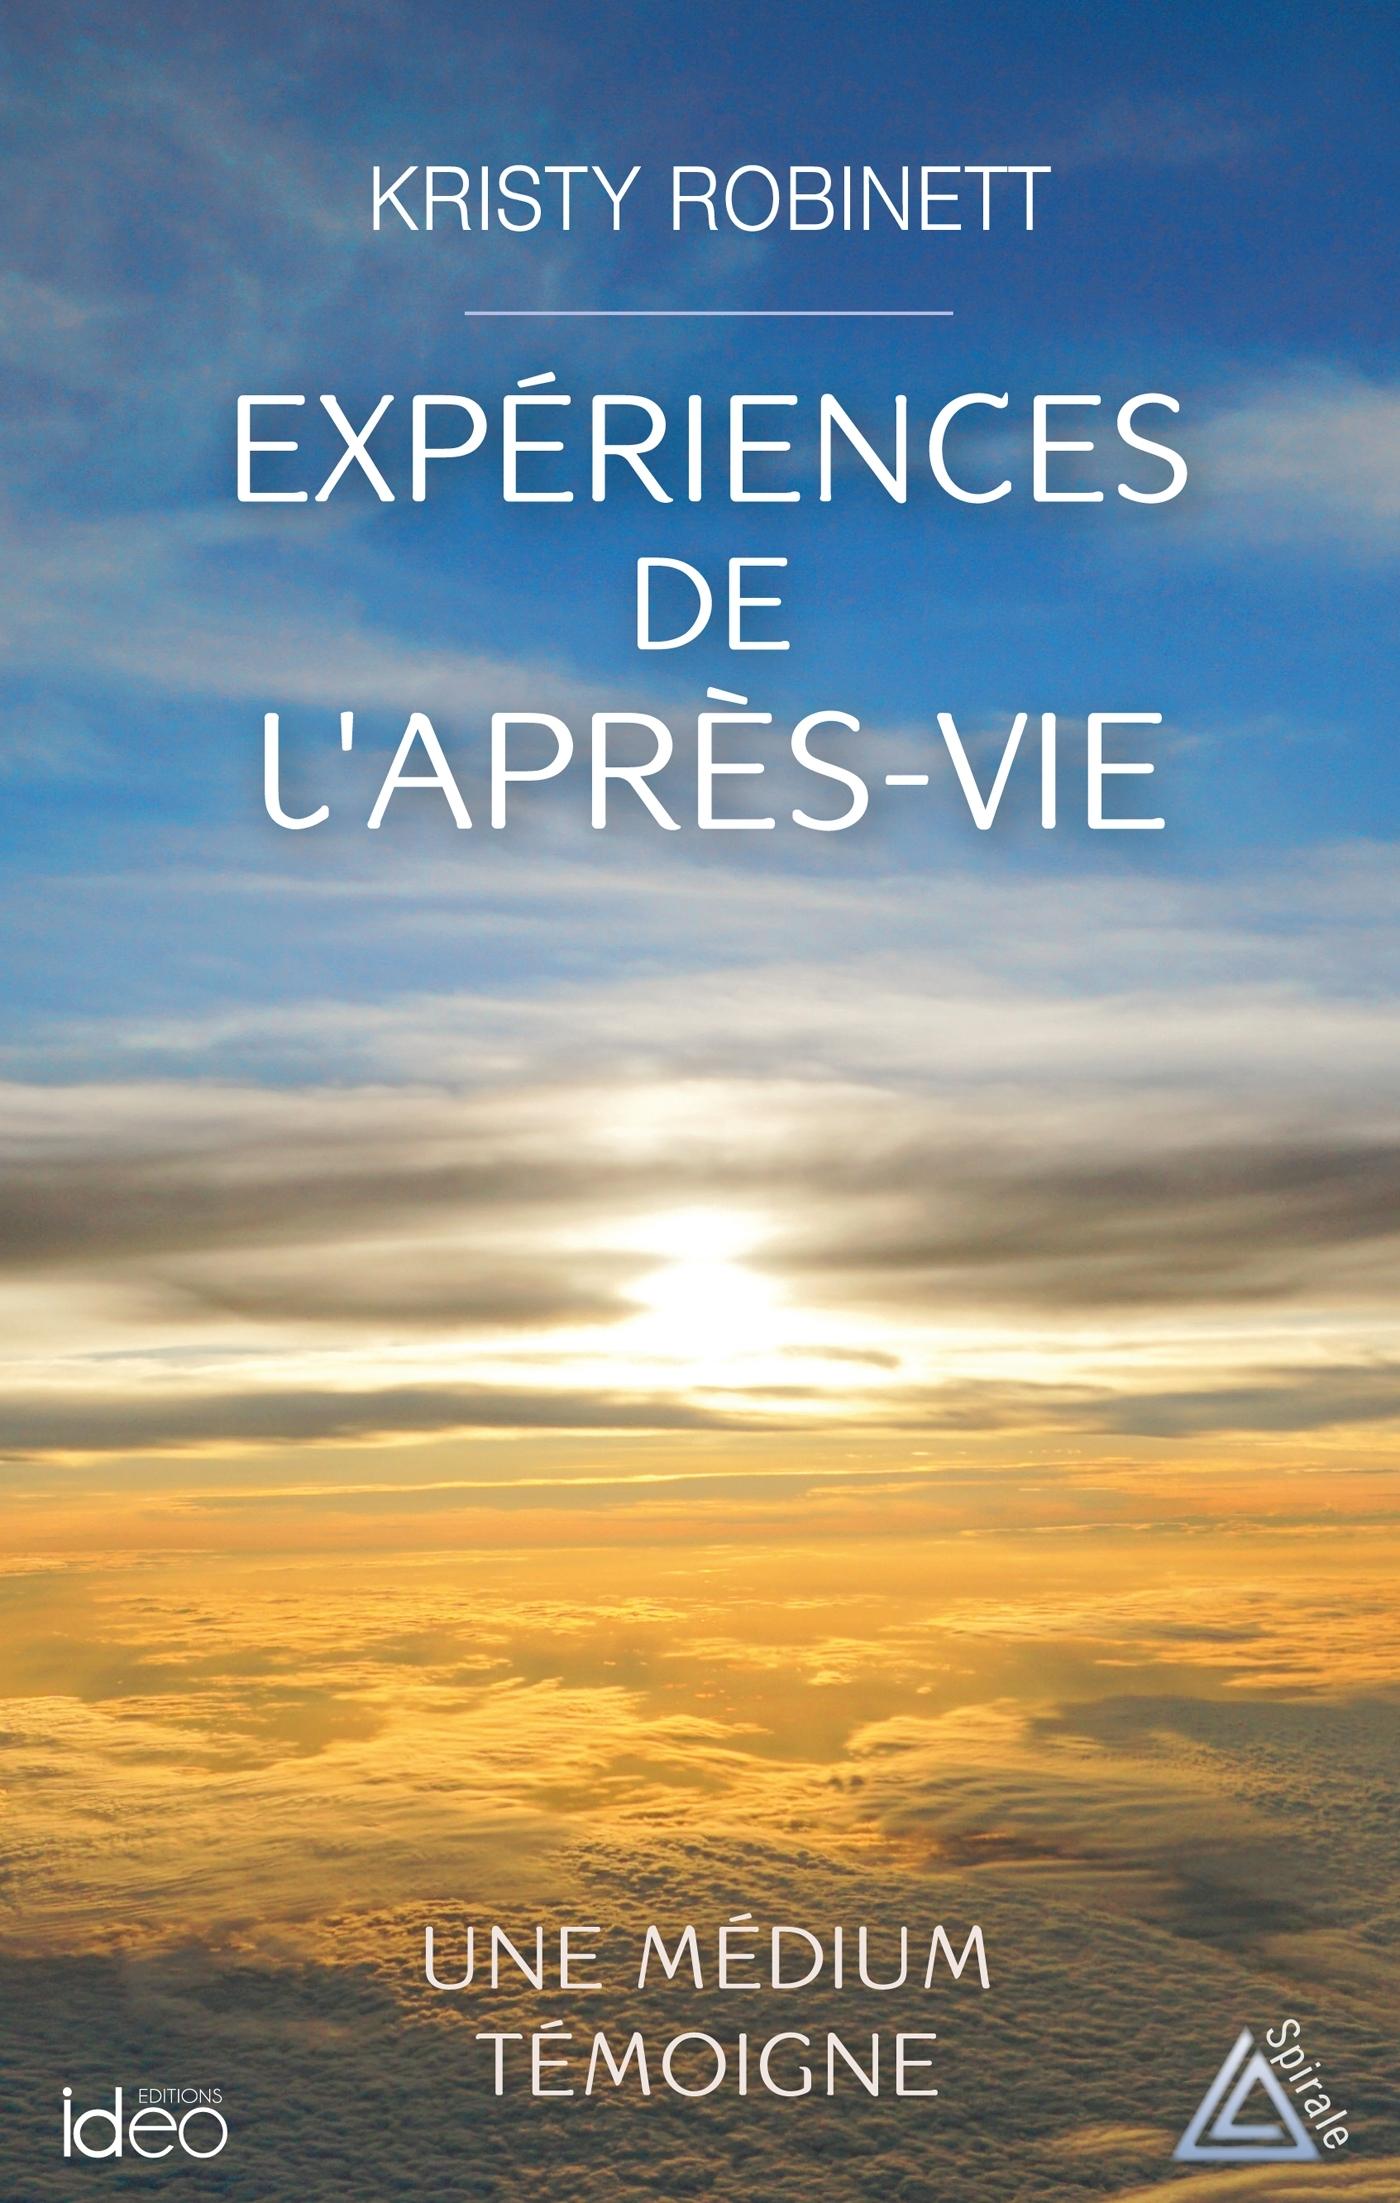 EXPERIENCES DE L'APRES-VIE